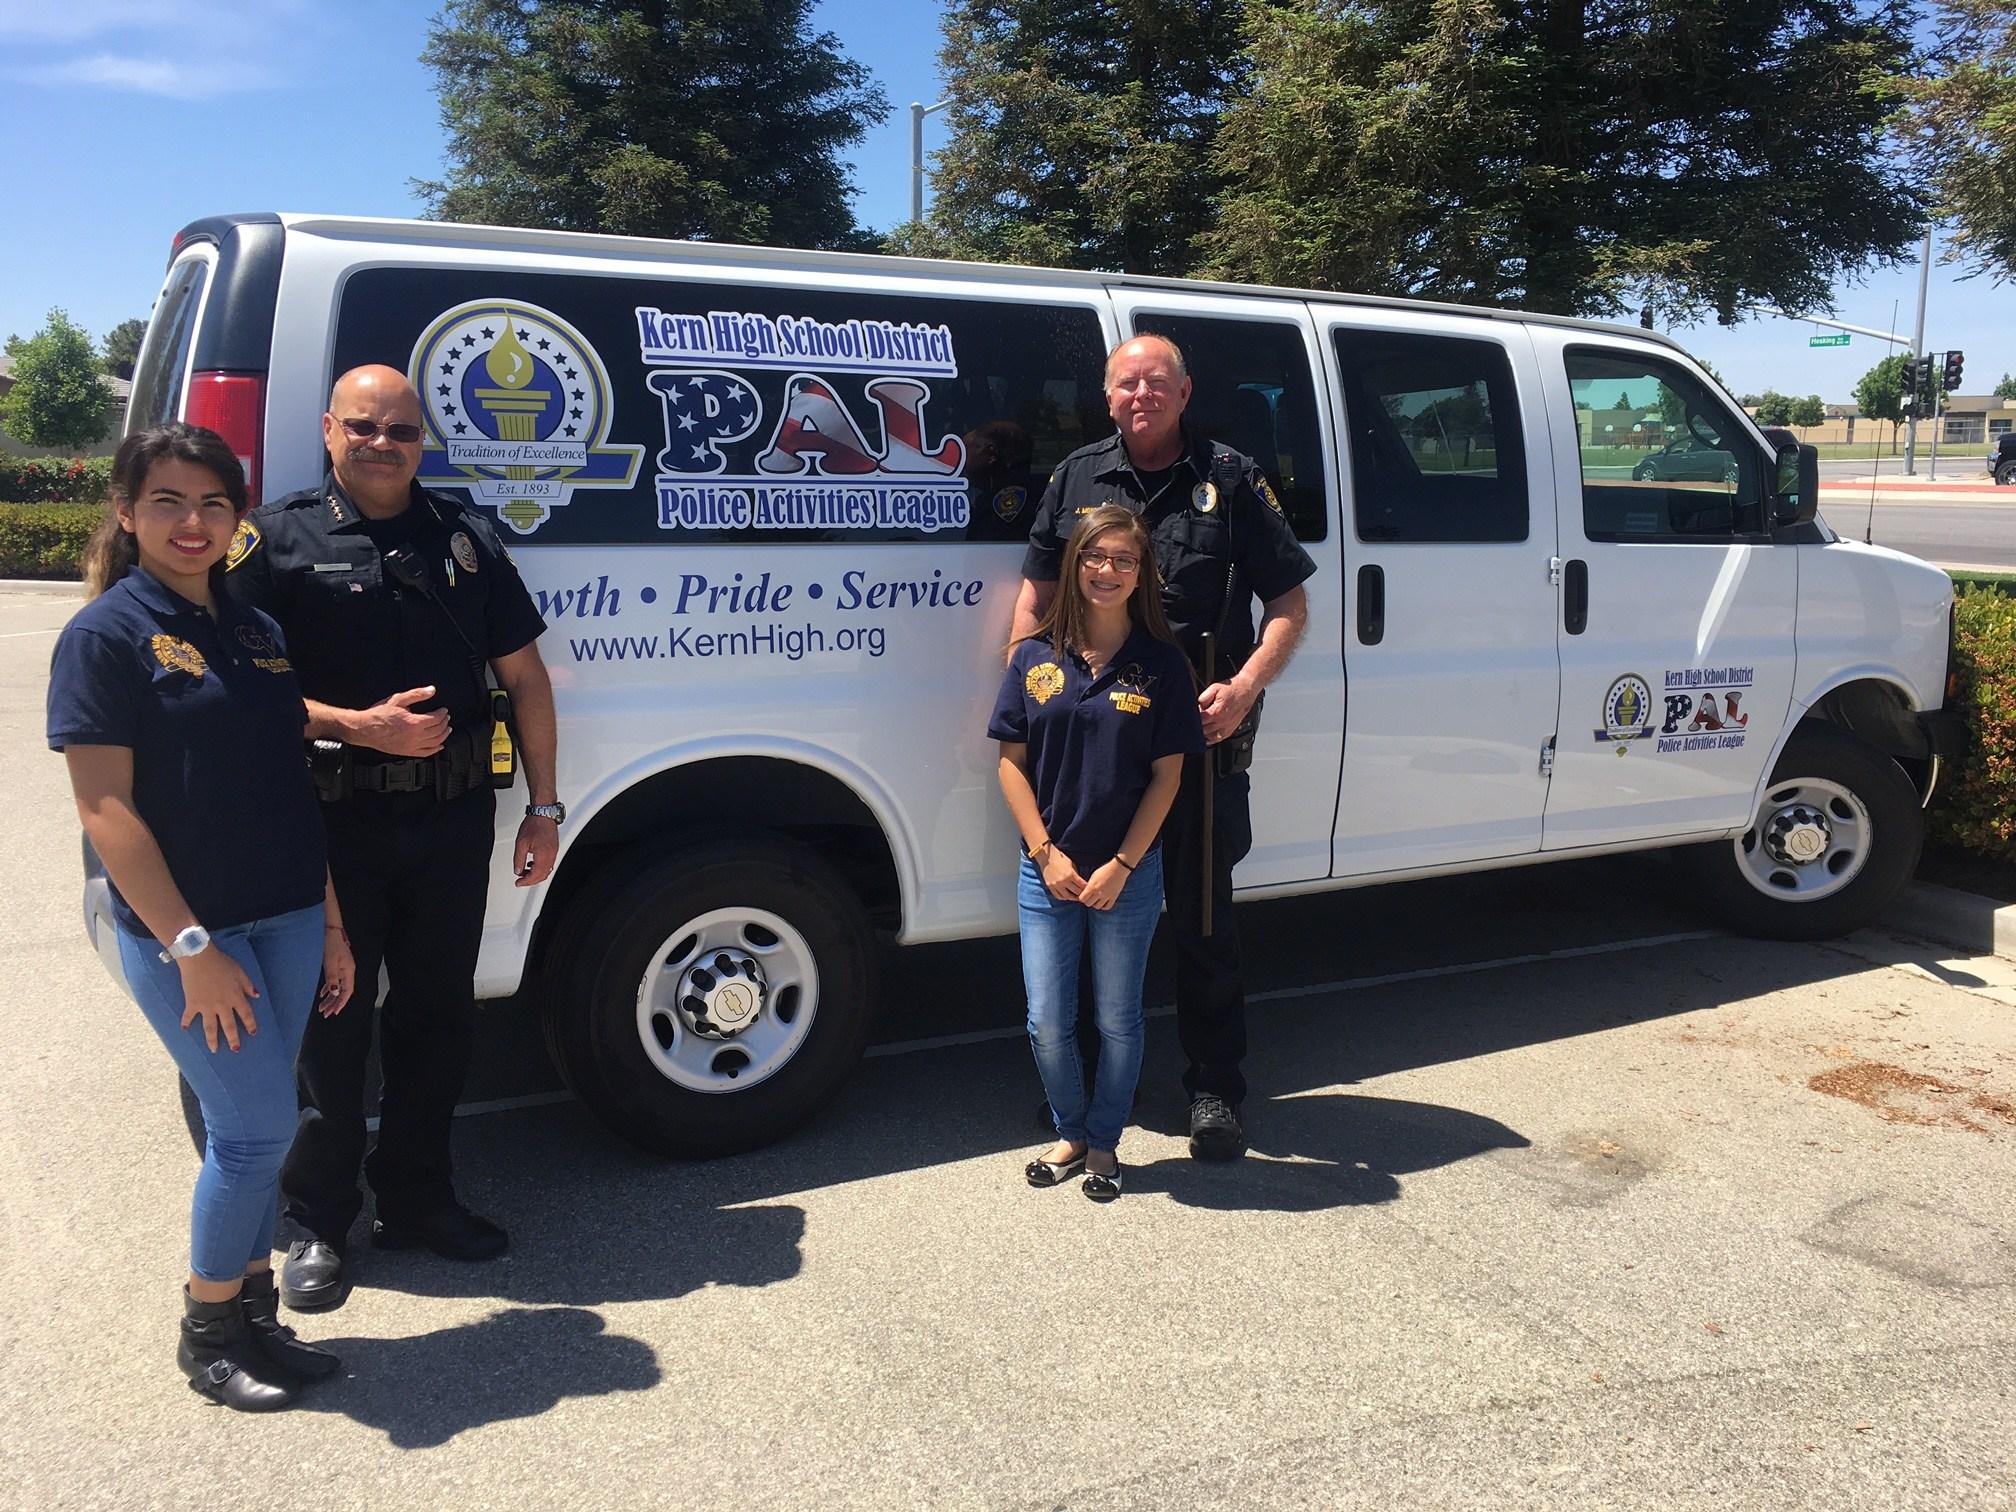 Police Activities League – Police Department – Kern High School District